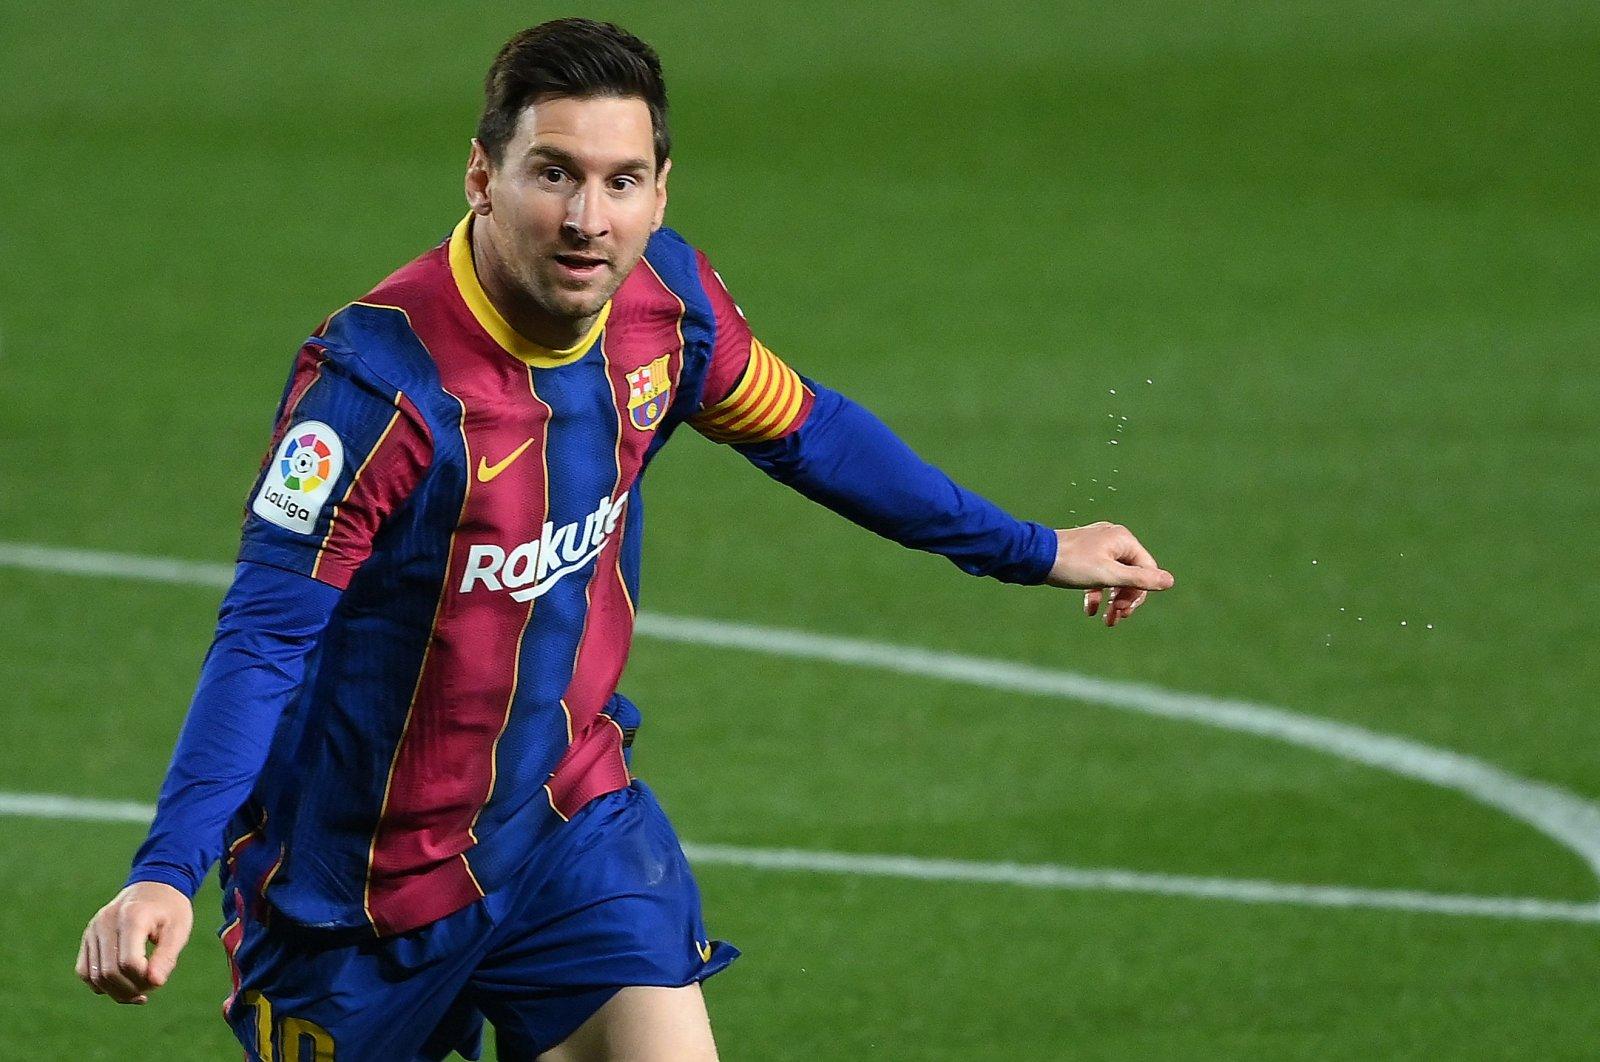 Barcelona's Argentinian forward Lionel Messi celebrates after scoring a goal against Getafe at the Camp Nou stadium, Barcelona, Spain, April 22, 2021. (AFP Photo)